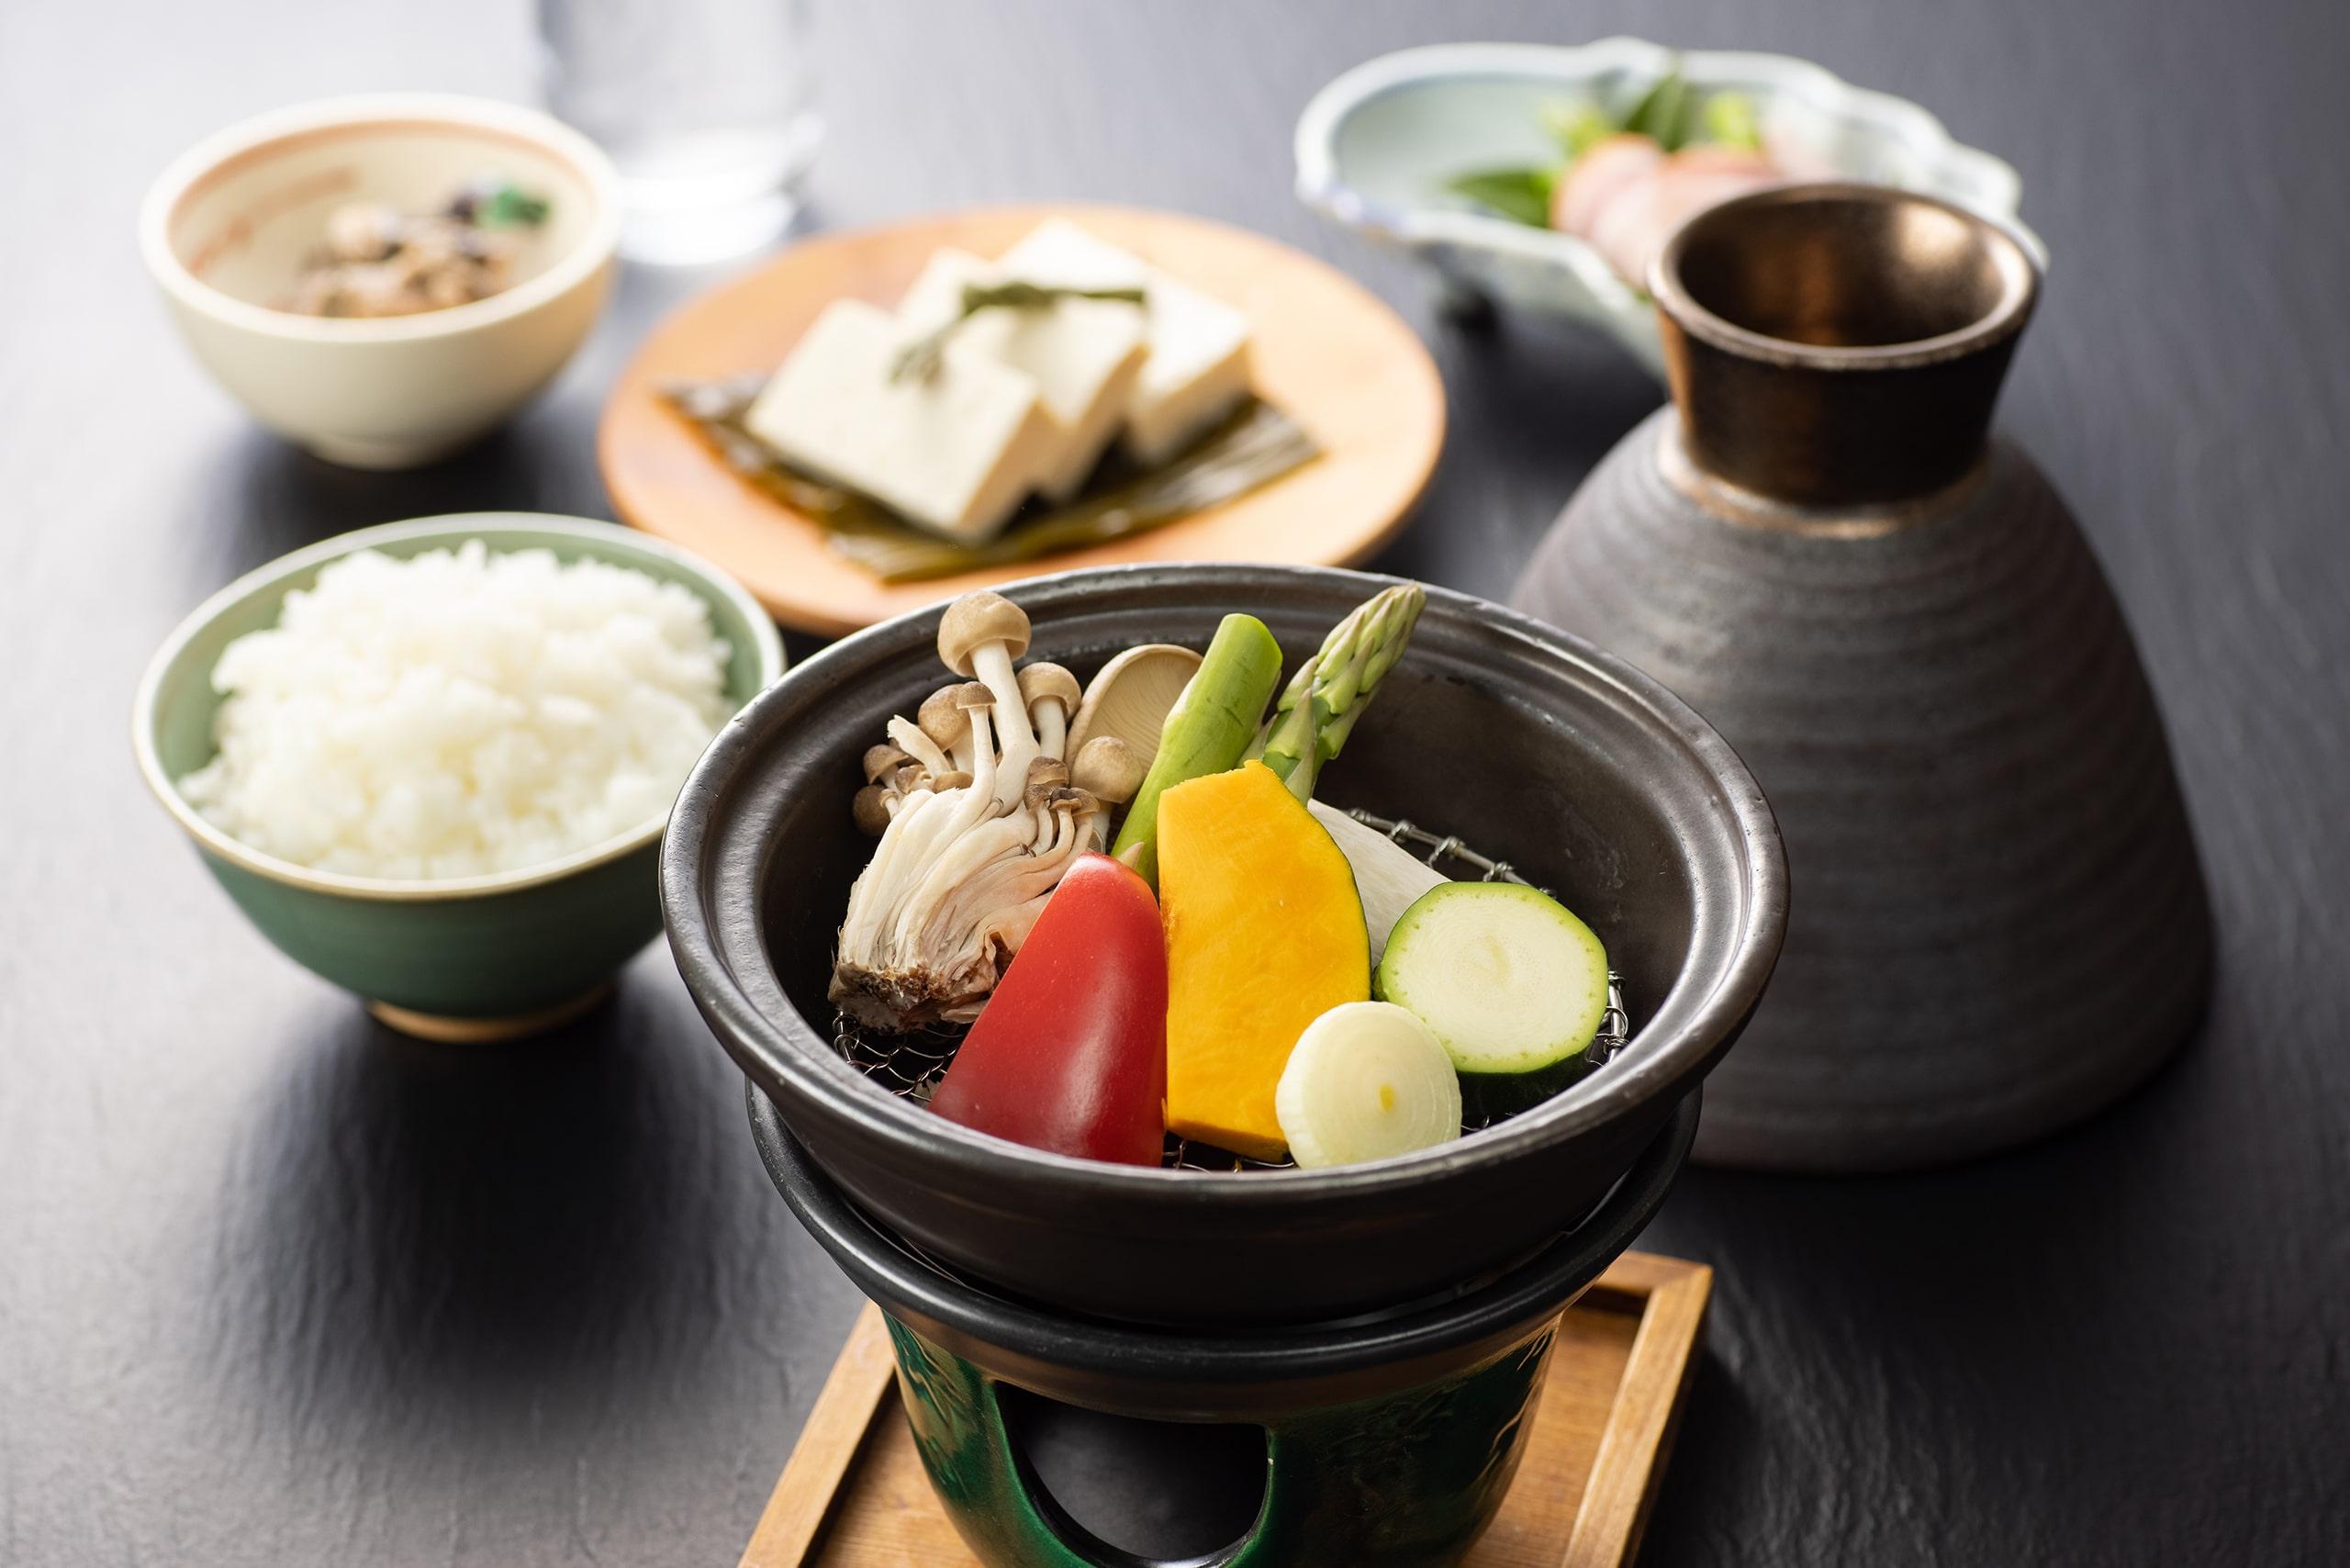 温泉野菜の温野菜